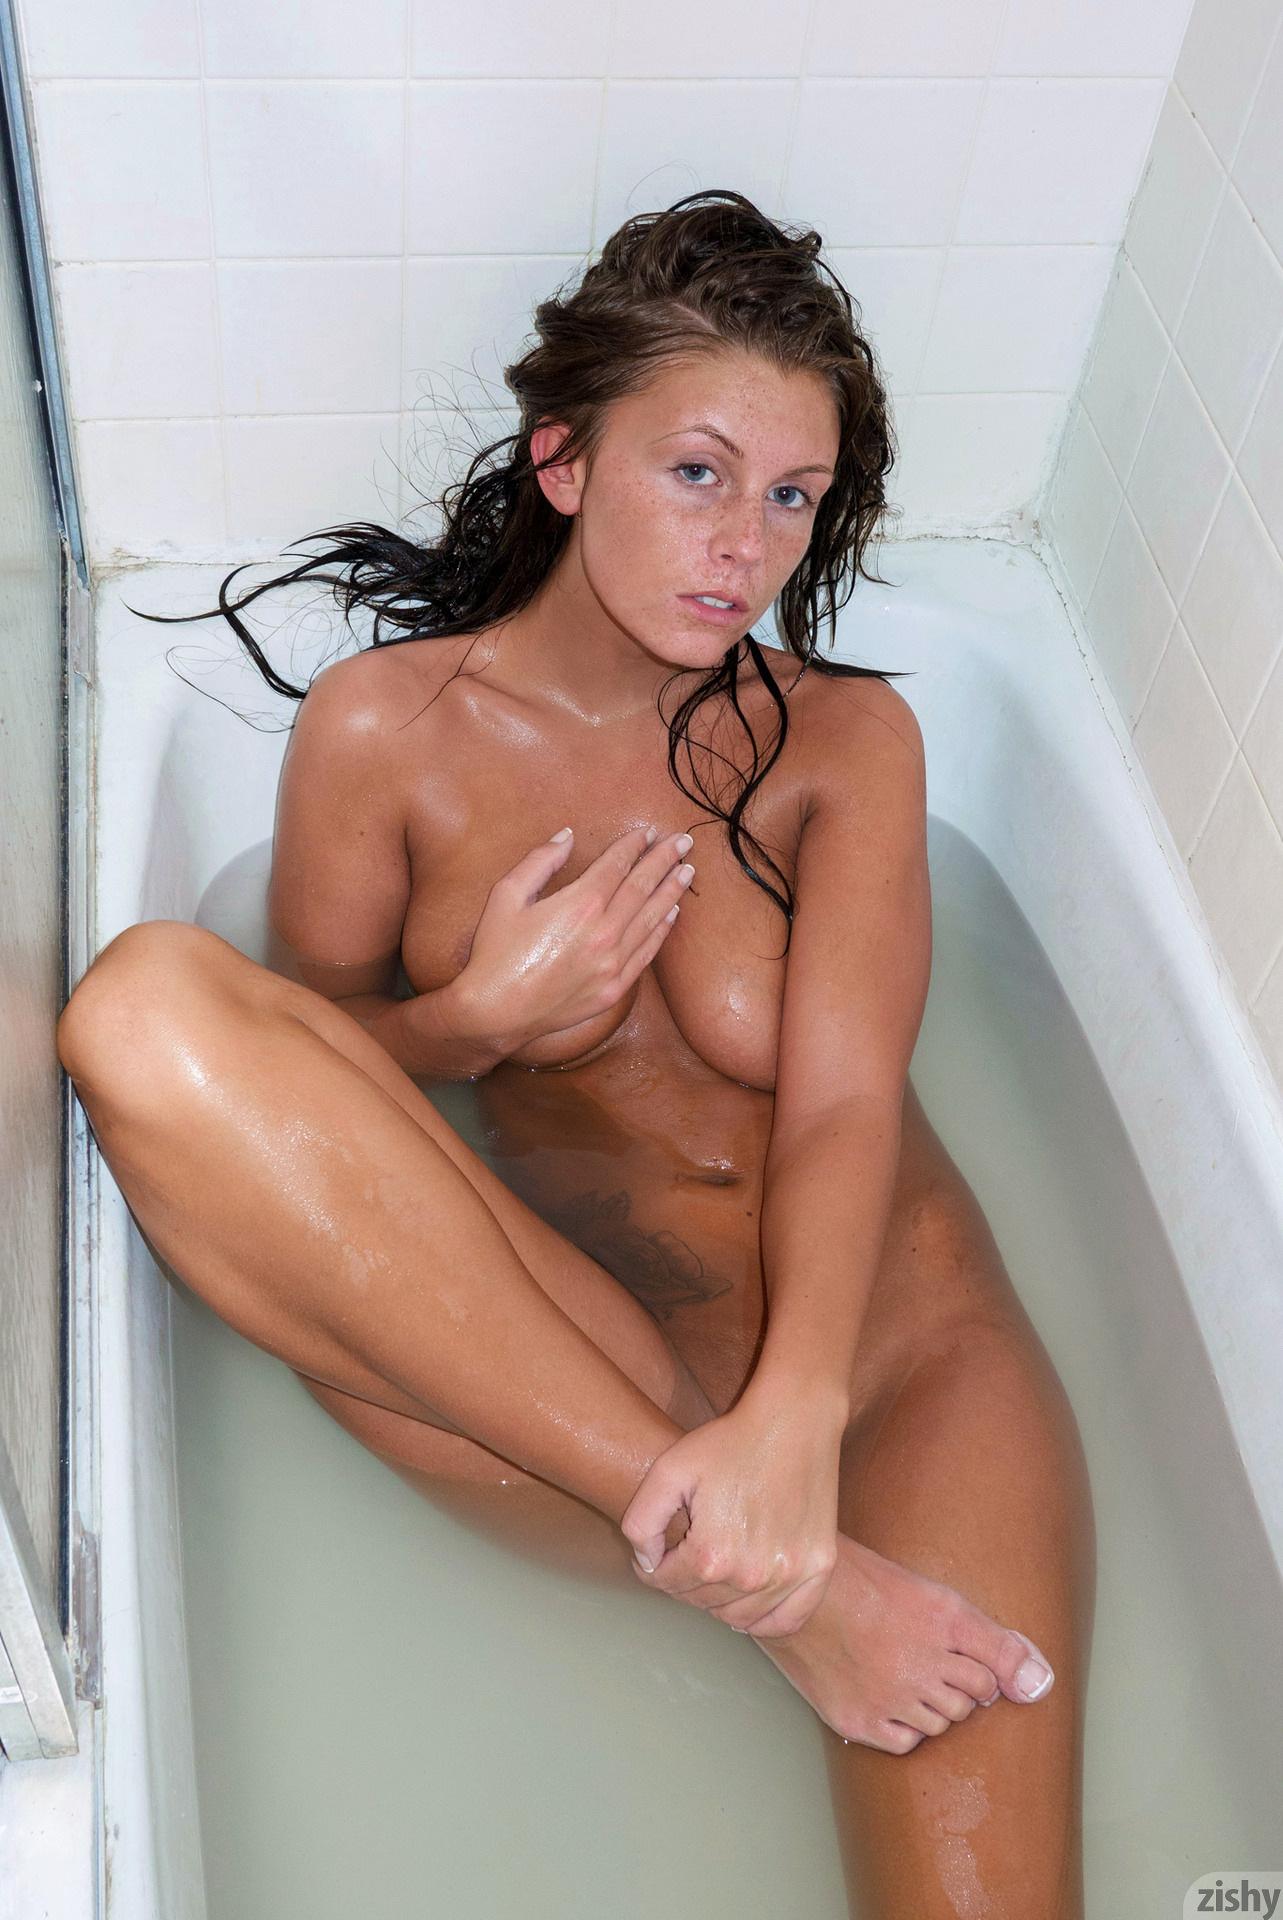 whitney-westgate-bathroom-shower-nude-zishy-21